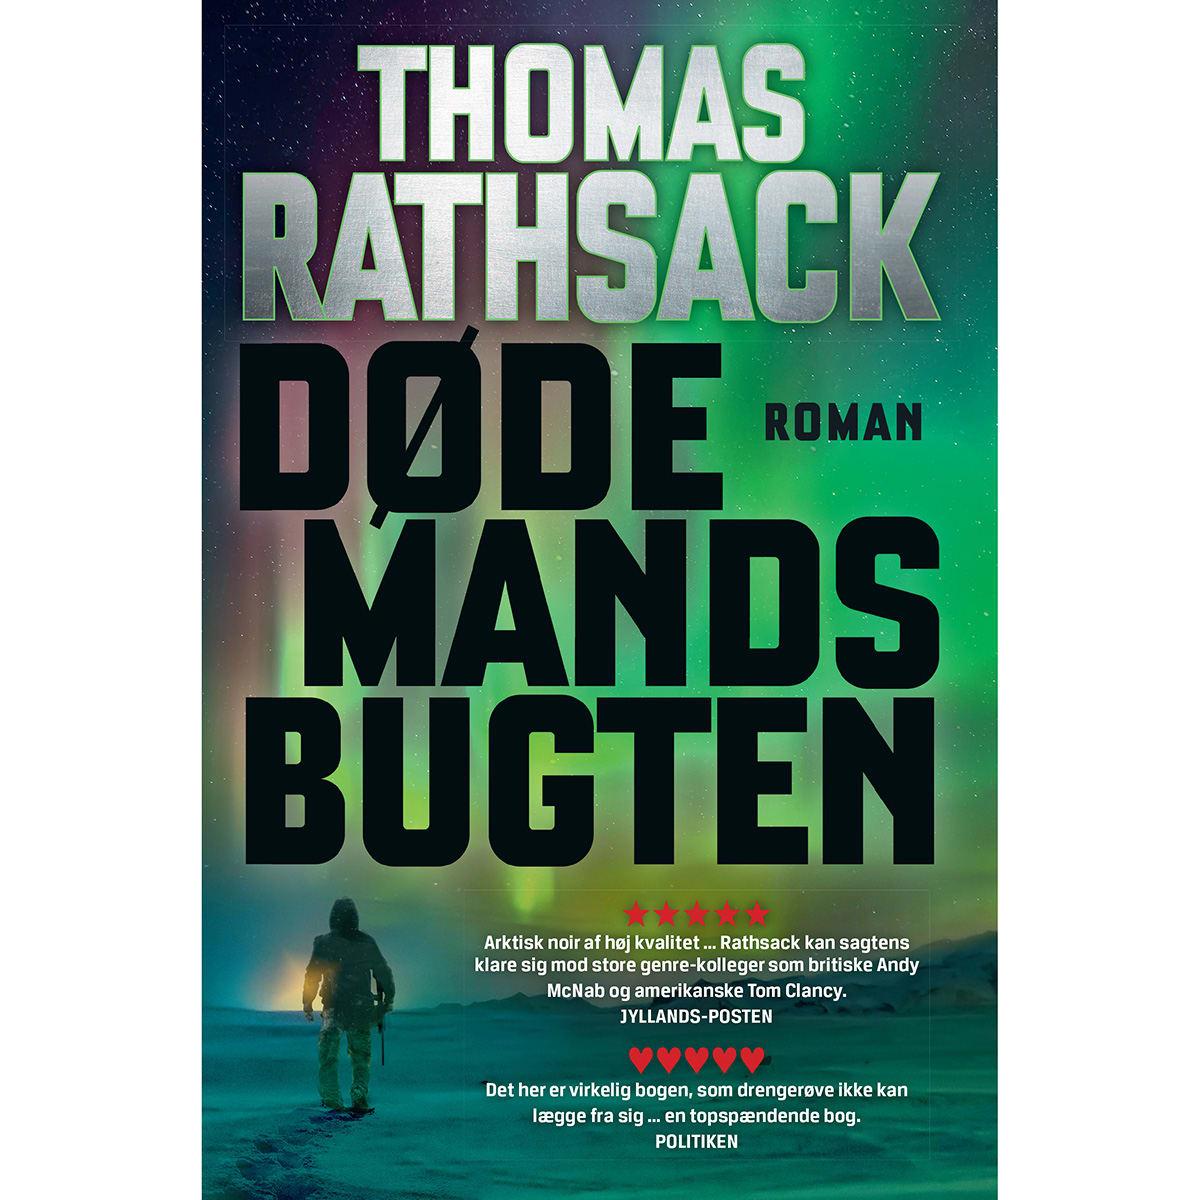 Af Thomas Rathsack